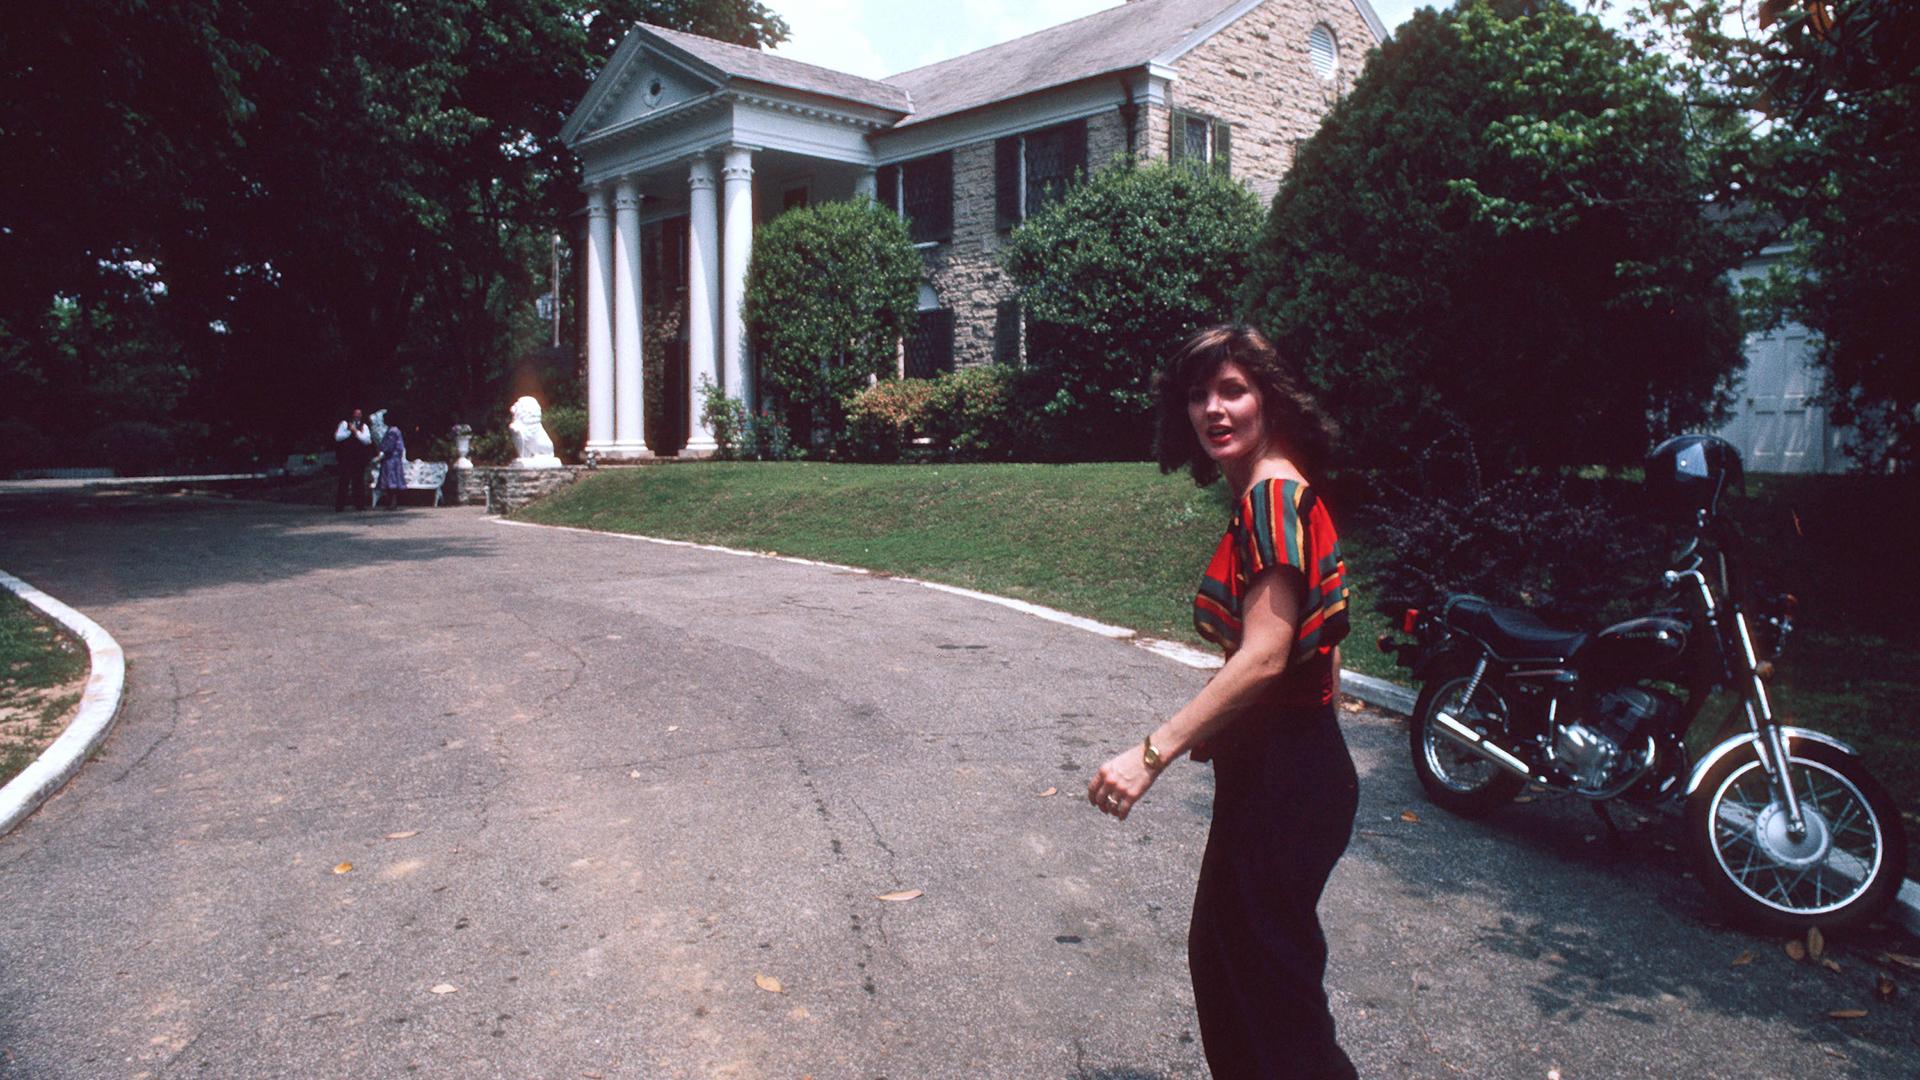 June 7, 1982: Priscilla Presley Opened Graceland to the Public